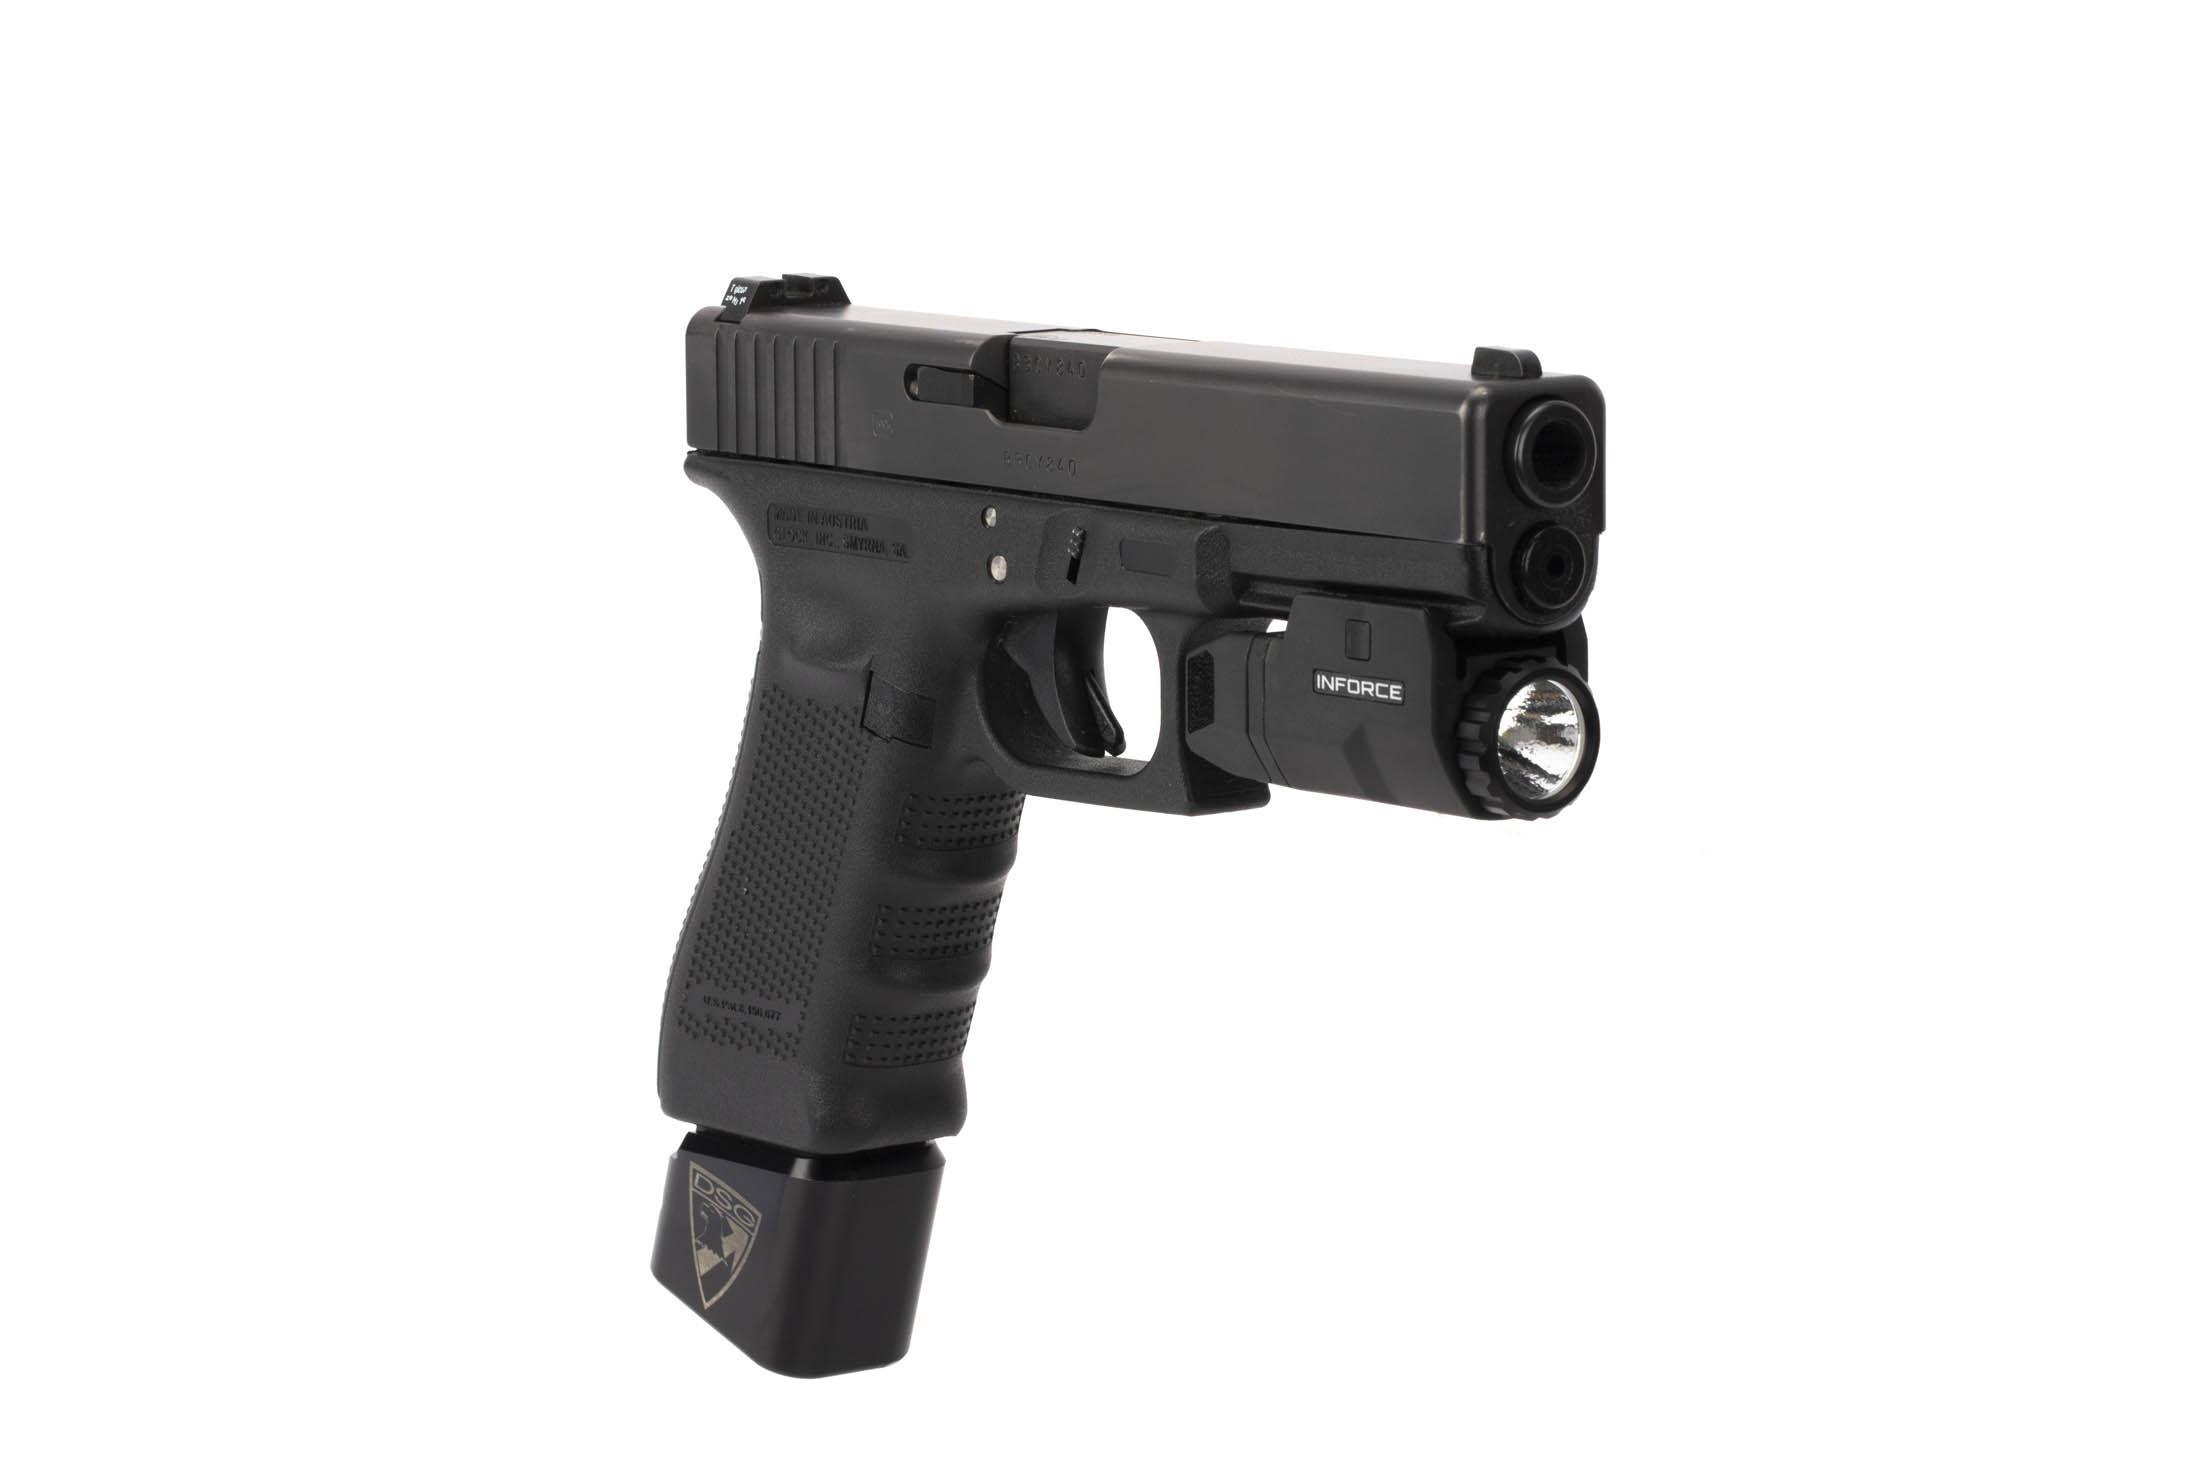 inforce aplc compact auto pistol light 200 lumens black ac 05 1